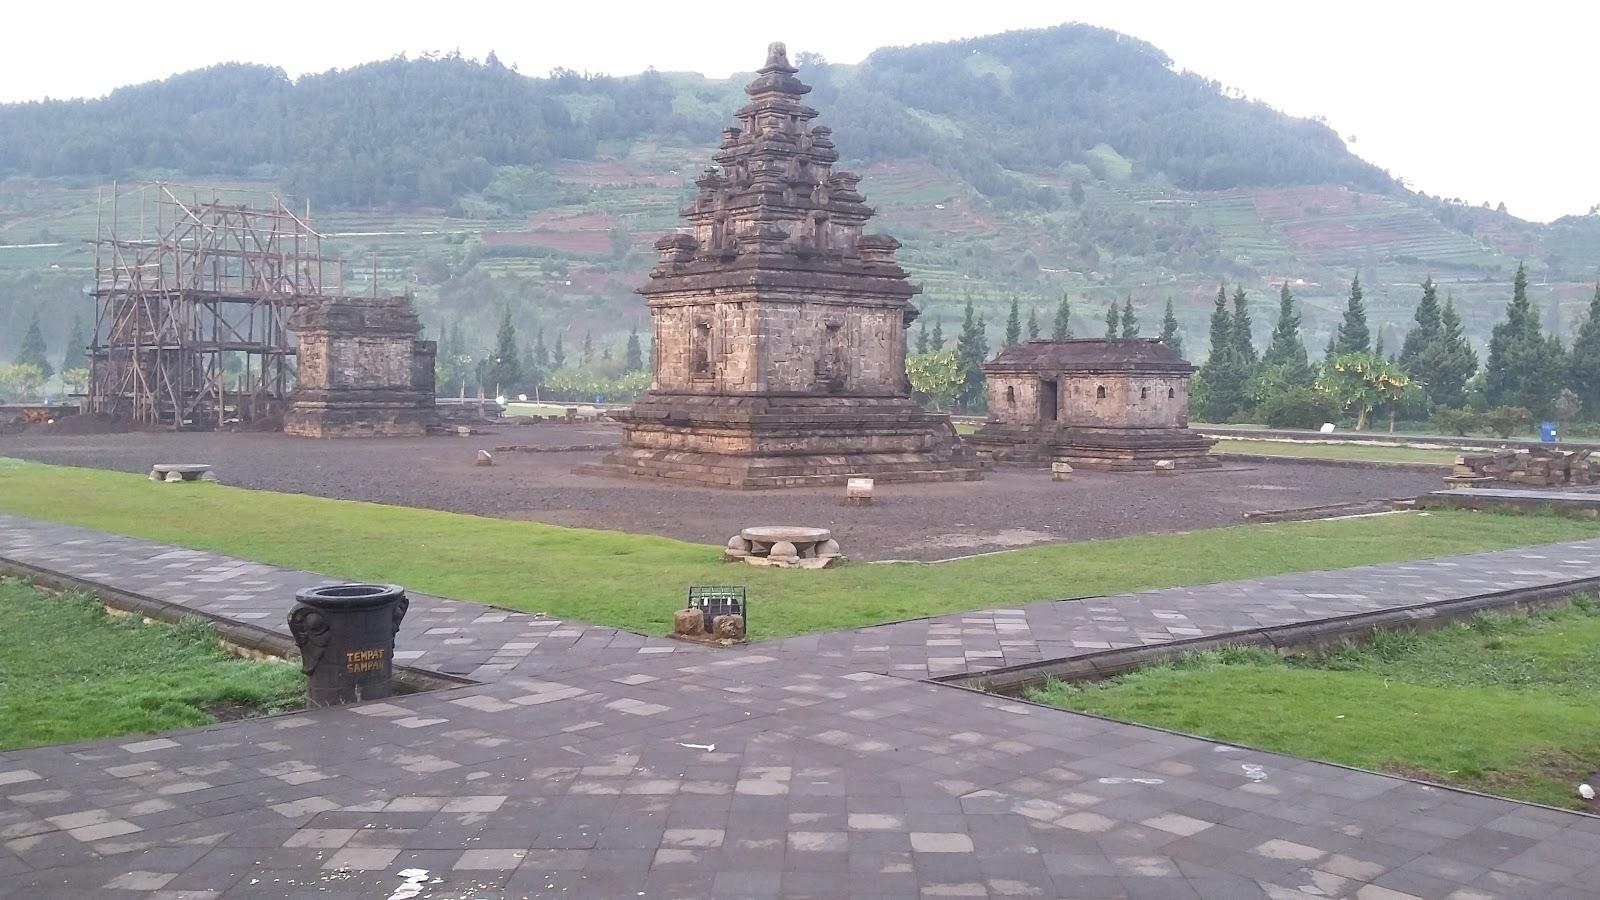 Kawaasan Candi Arjuna Dieng Noto Budiyanto Komplek Hindu Berada Pusat